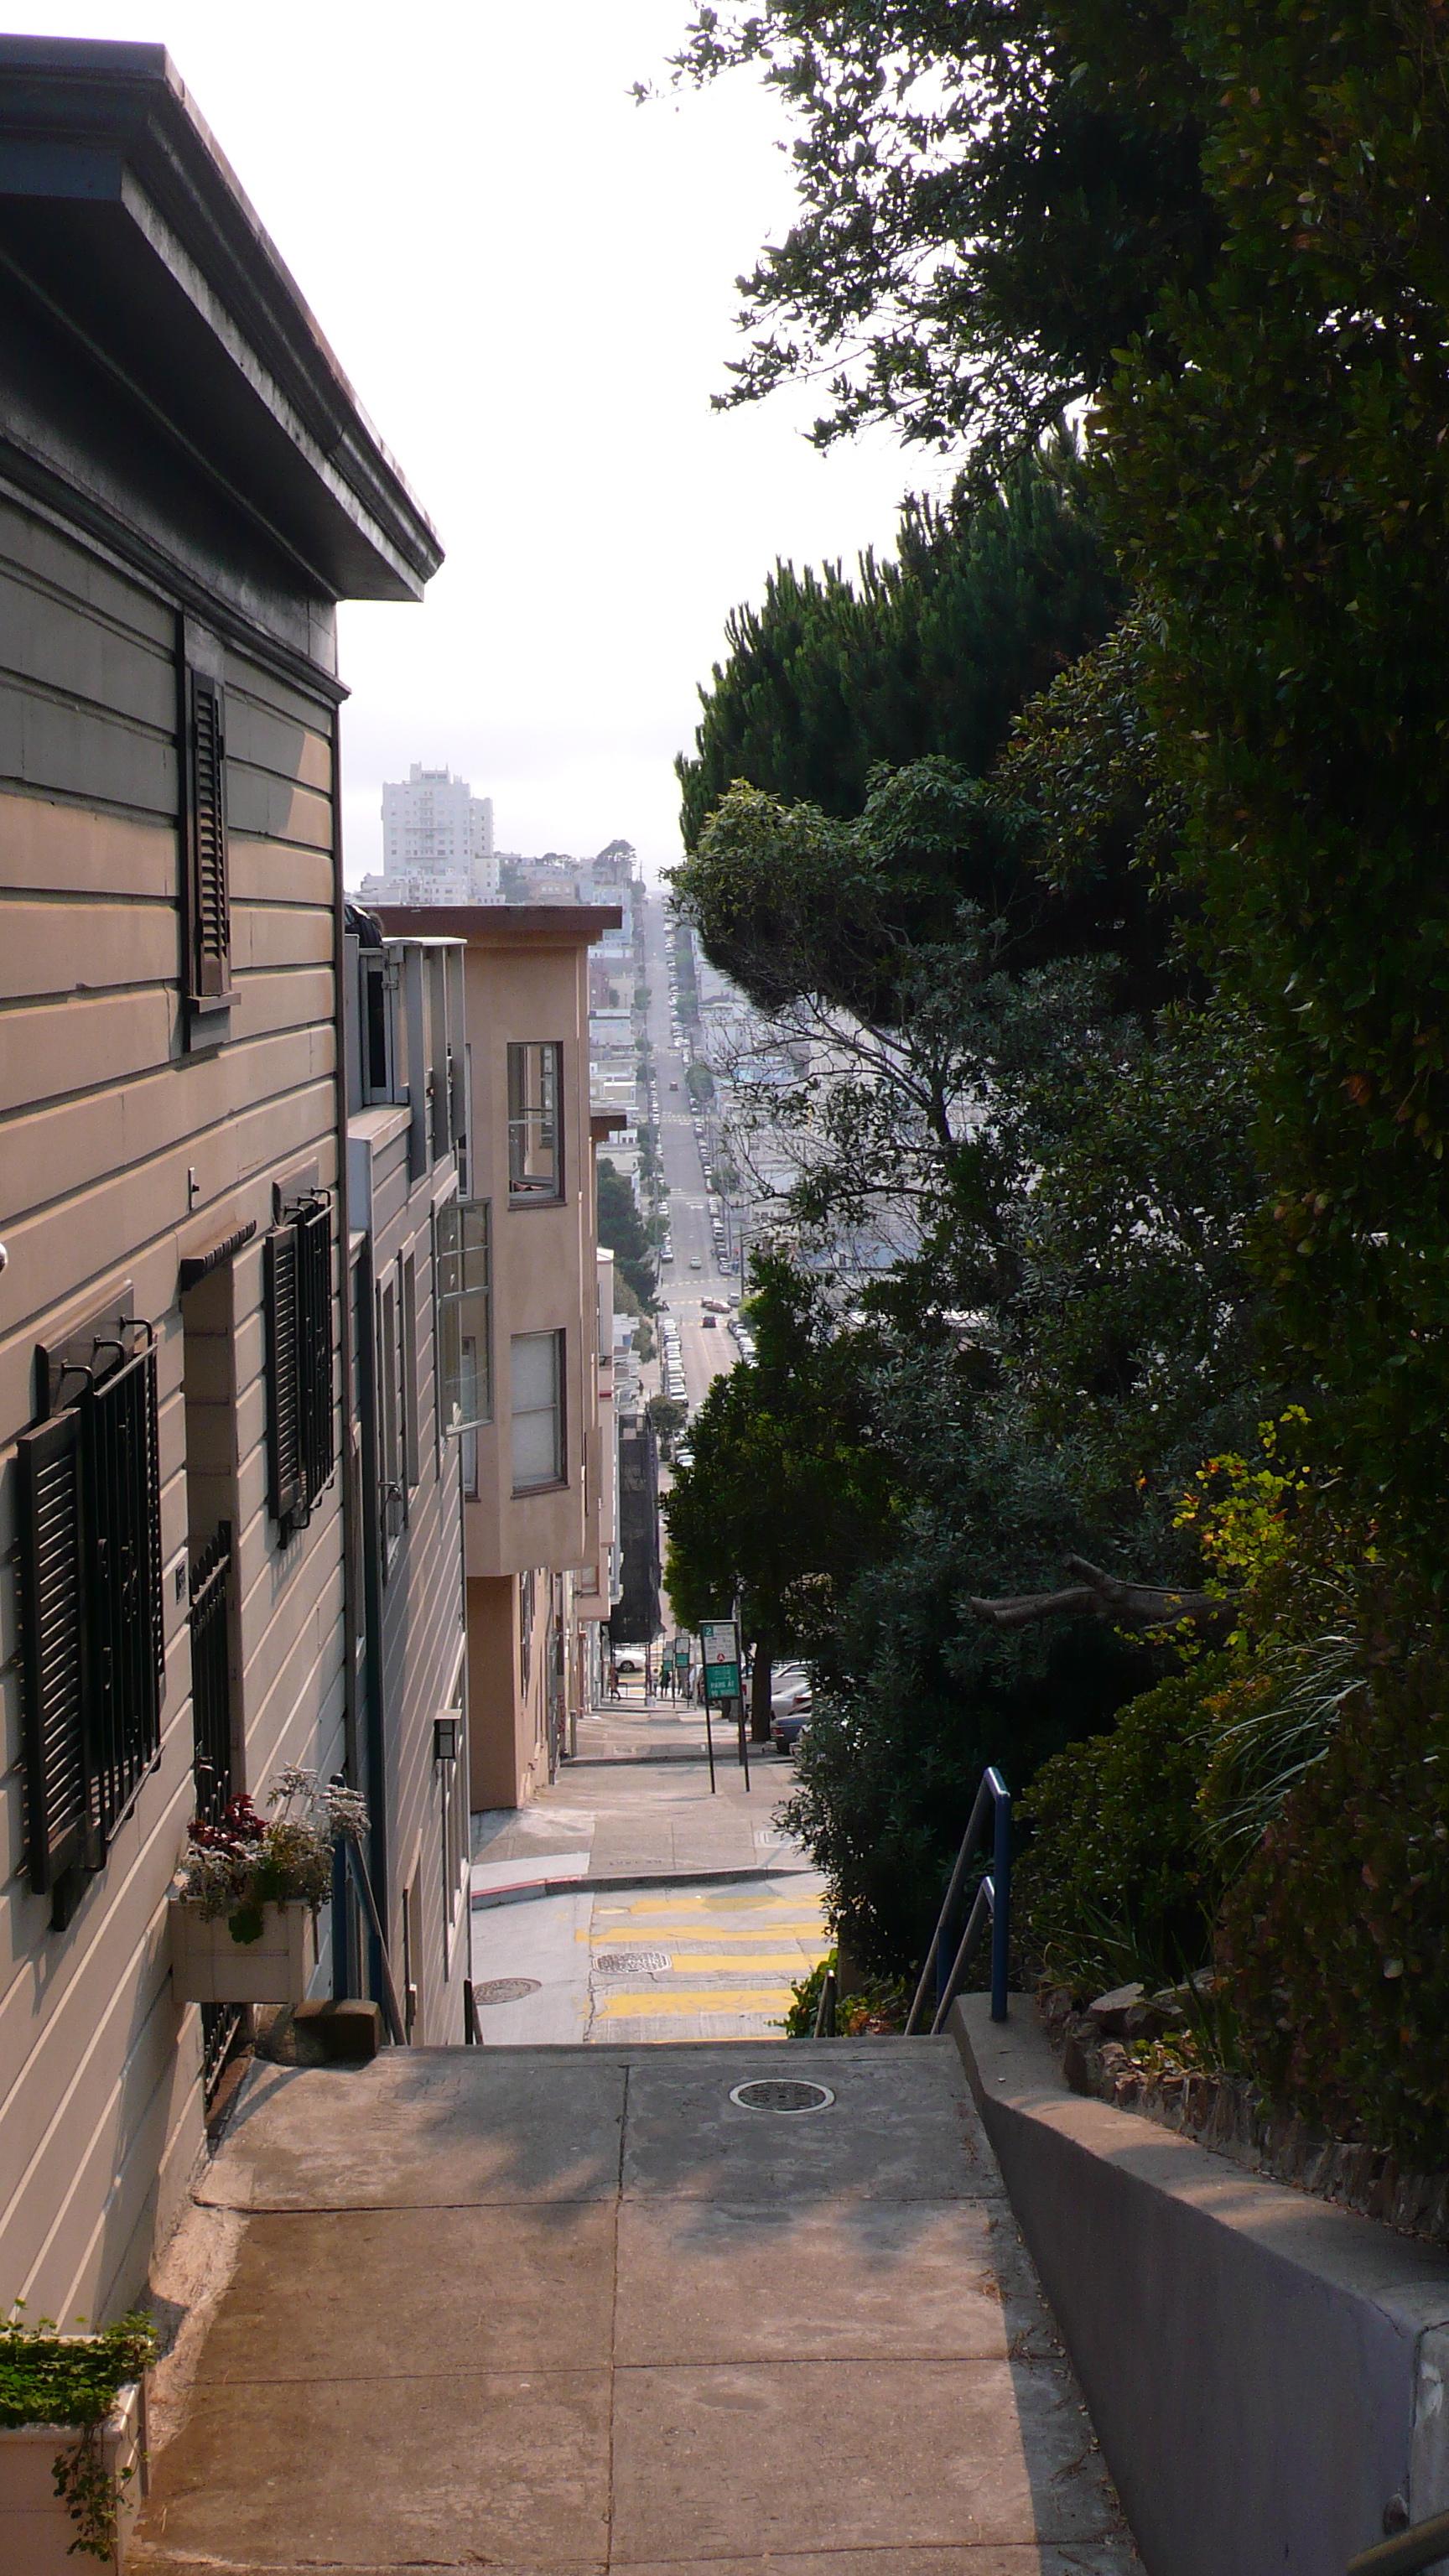 Stairway, San Francisco